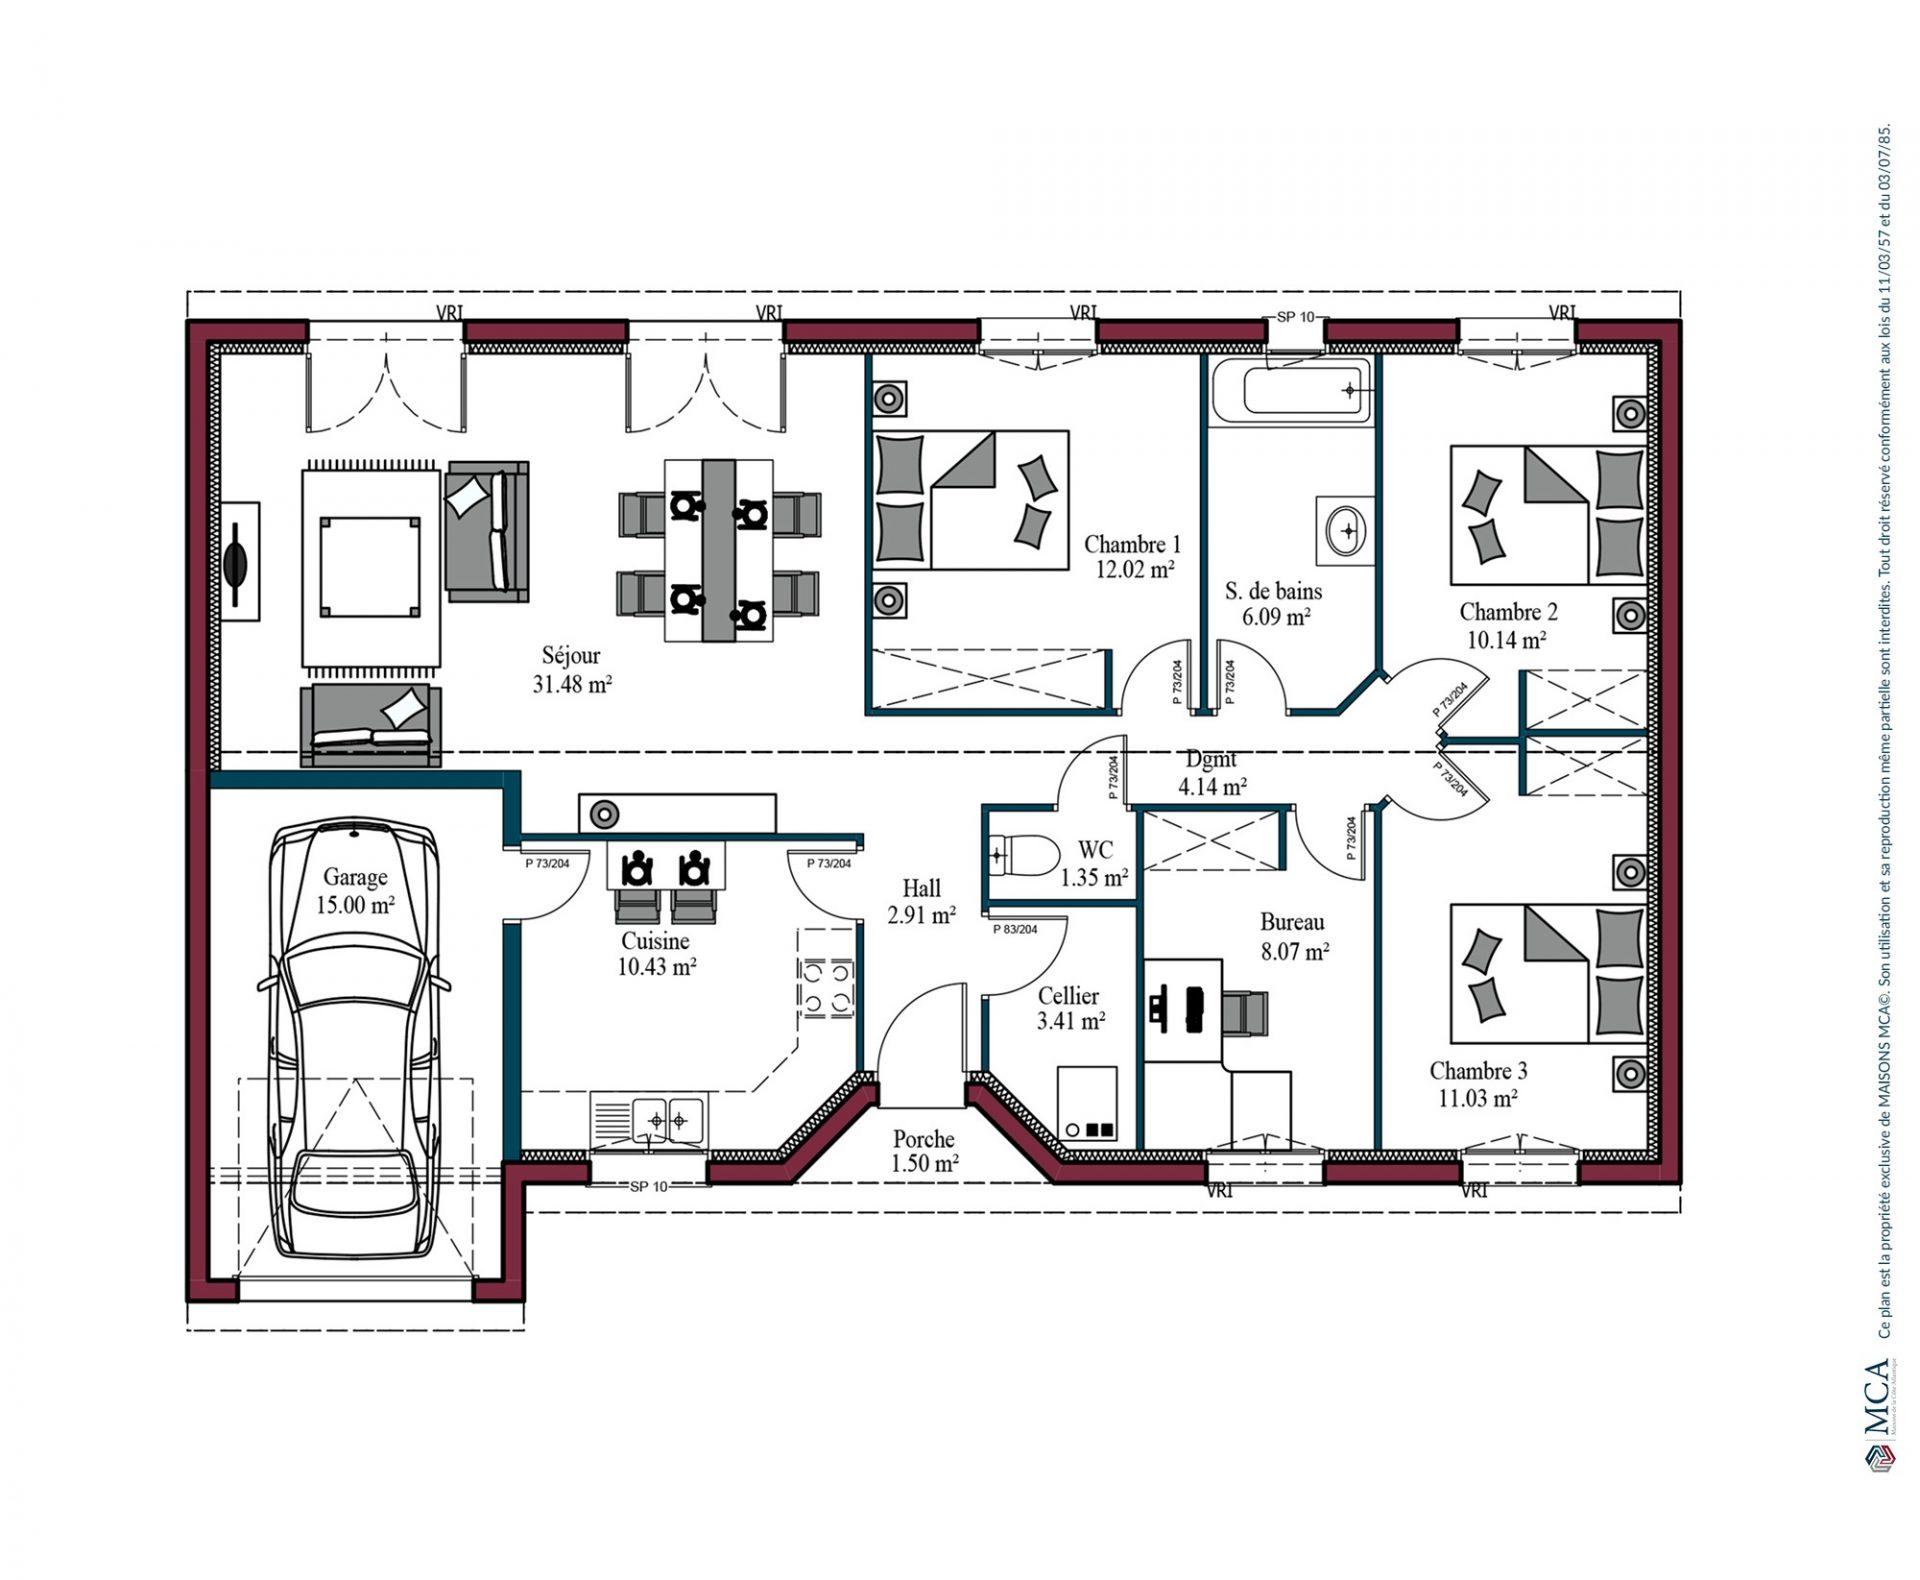 Plan maison mca ventana blog - Plan maison plain pied 1 chambre ...